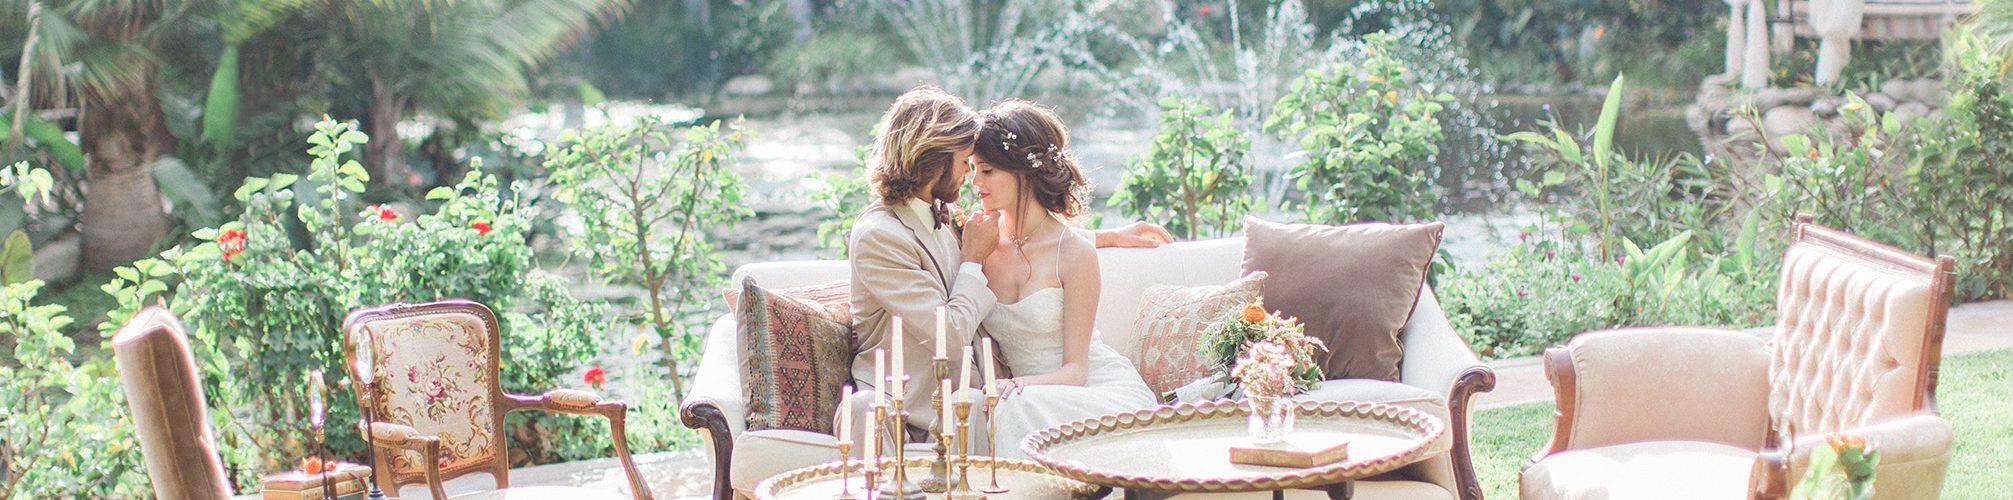 Eden Gardens Weddings A Boutique Event Venue